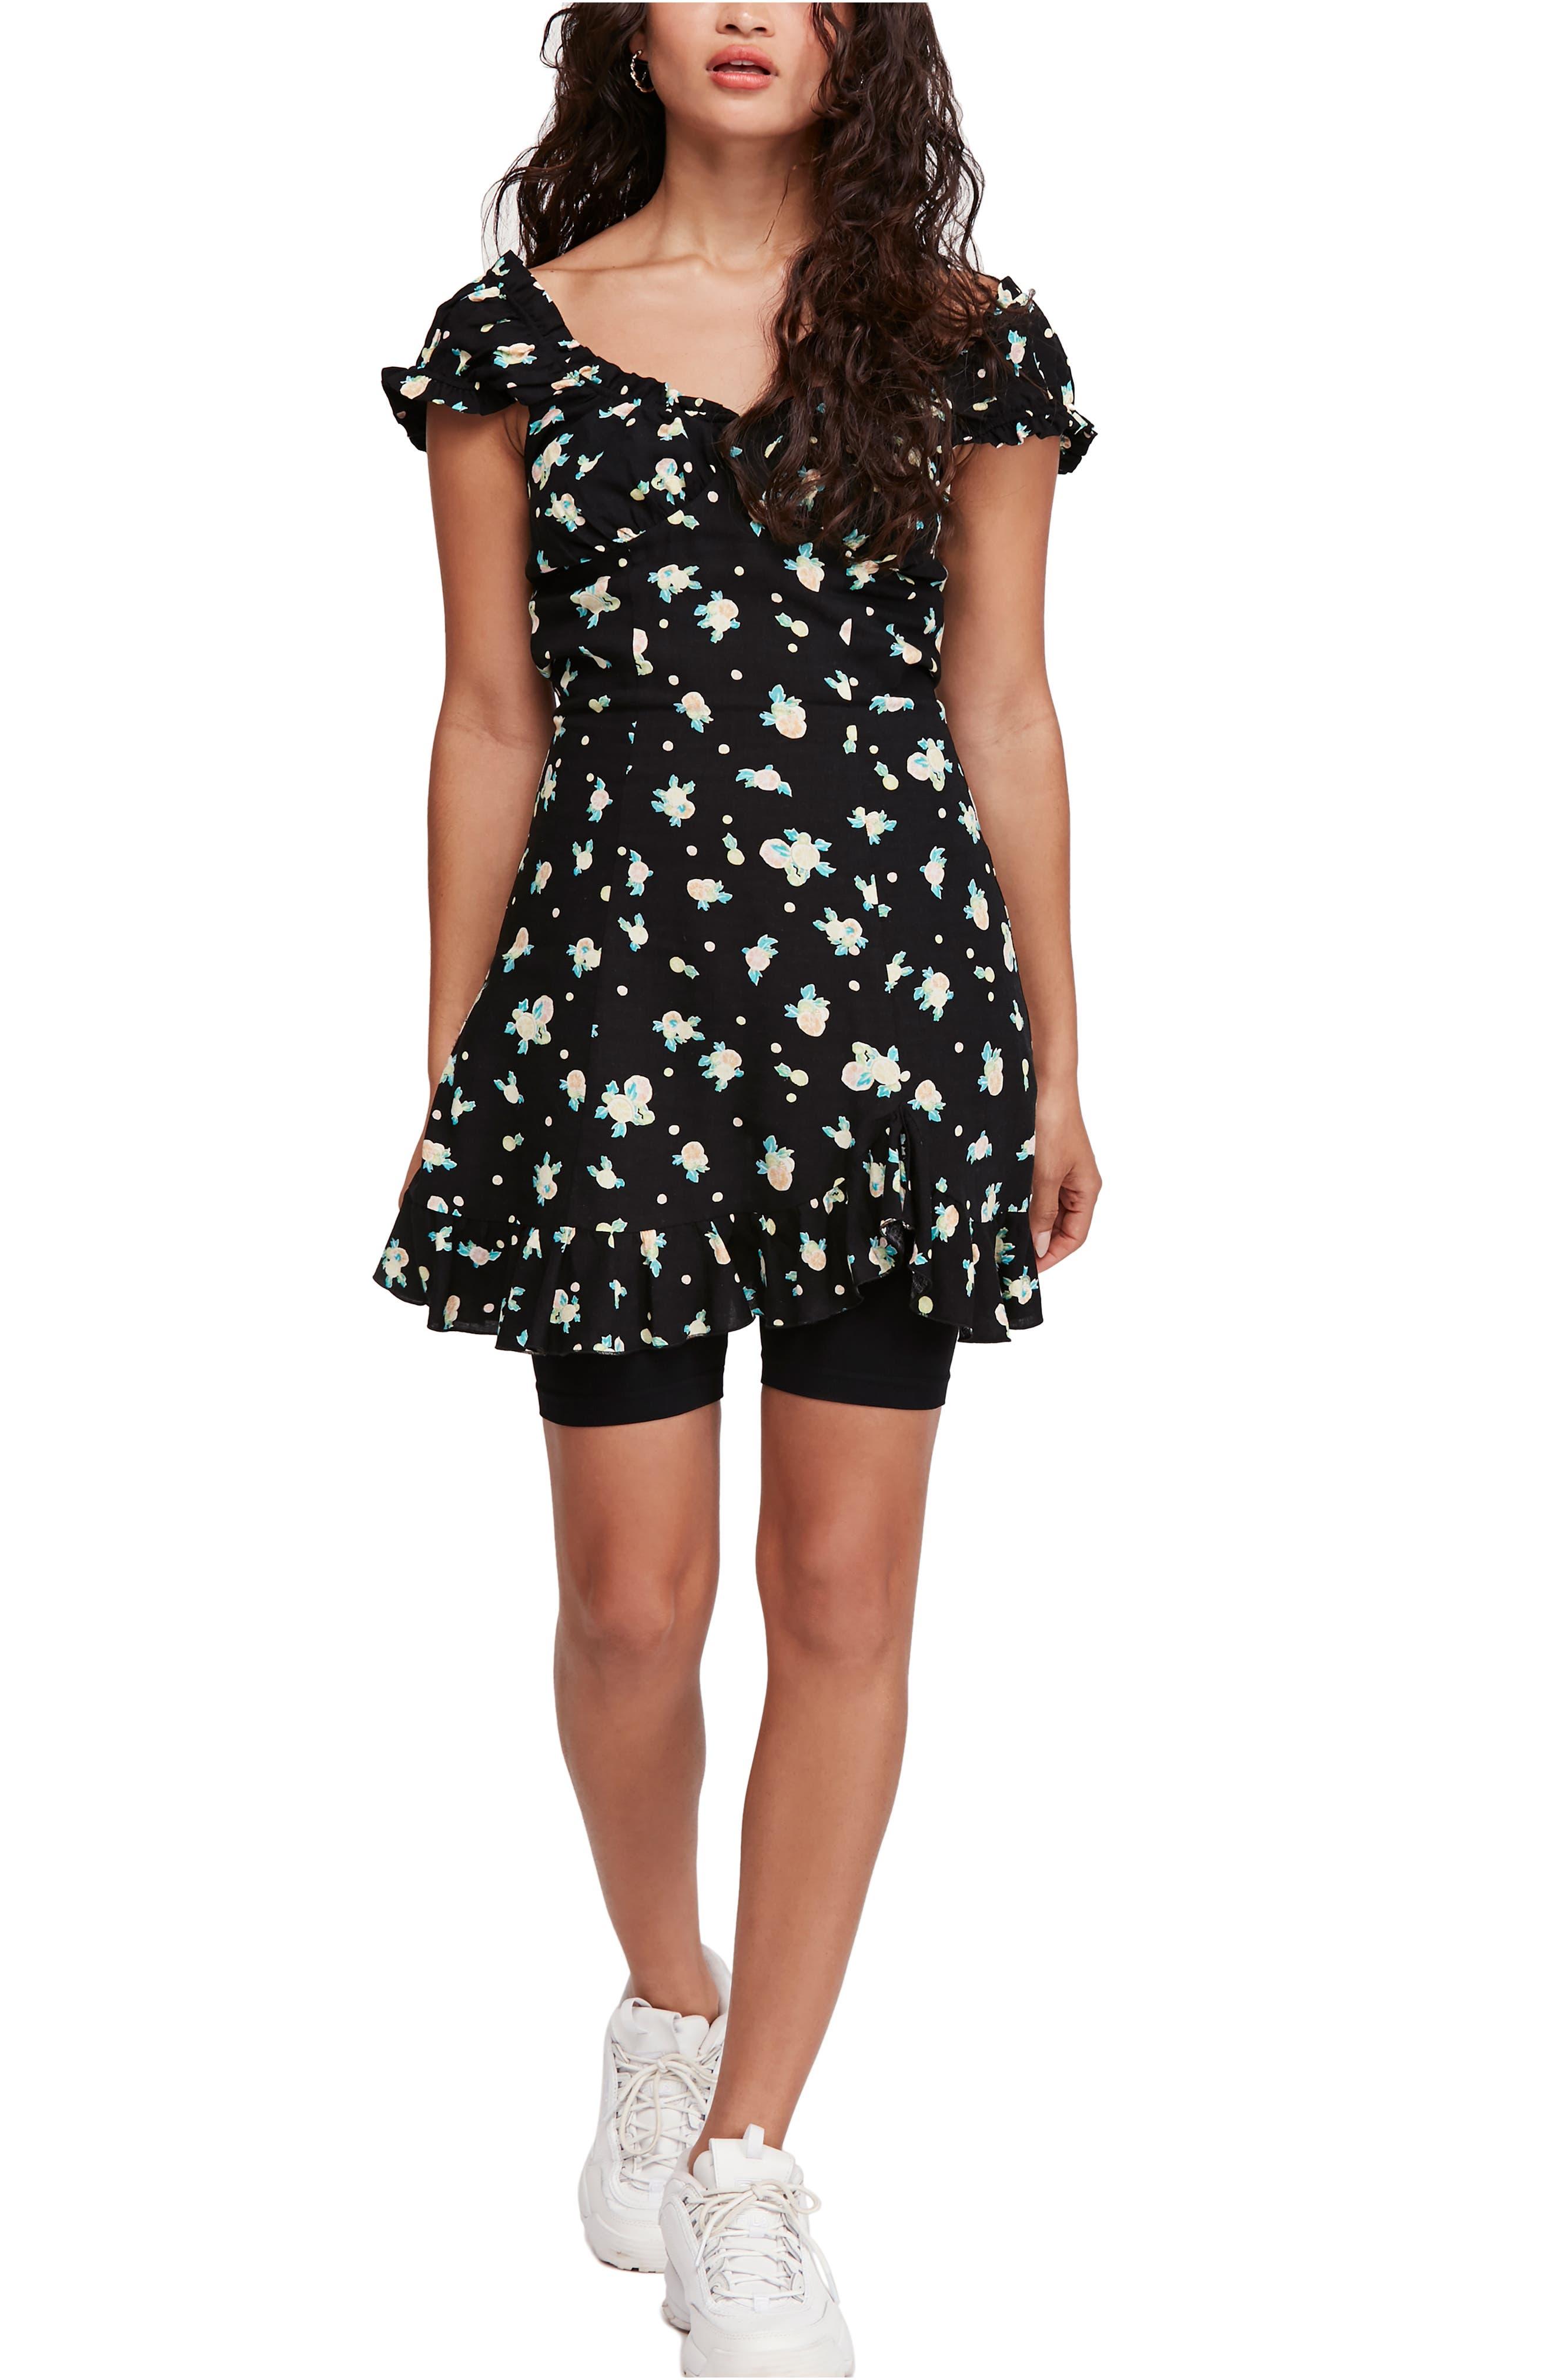 Free People Like A Lady Print Minidress, Black